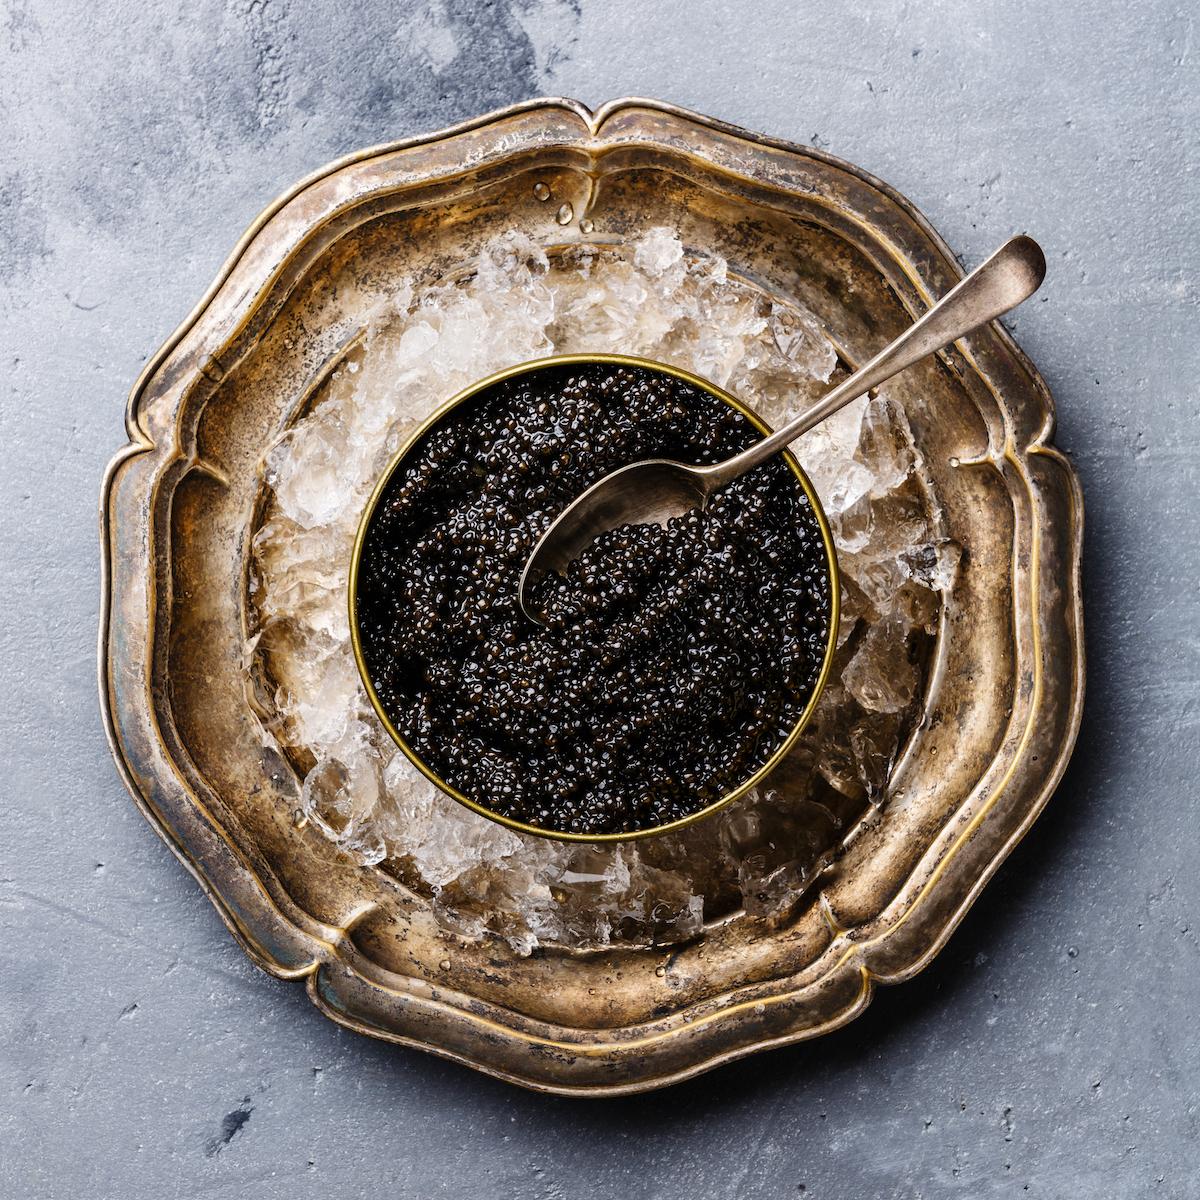 Caviar ©Lisovskaya Natalia shutterstock